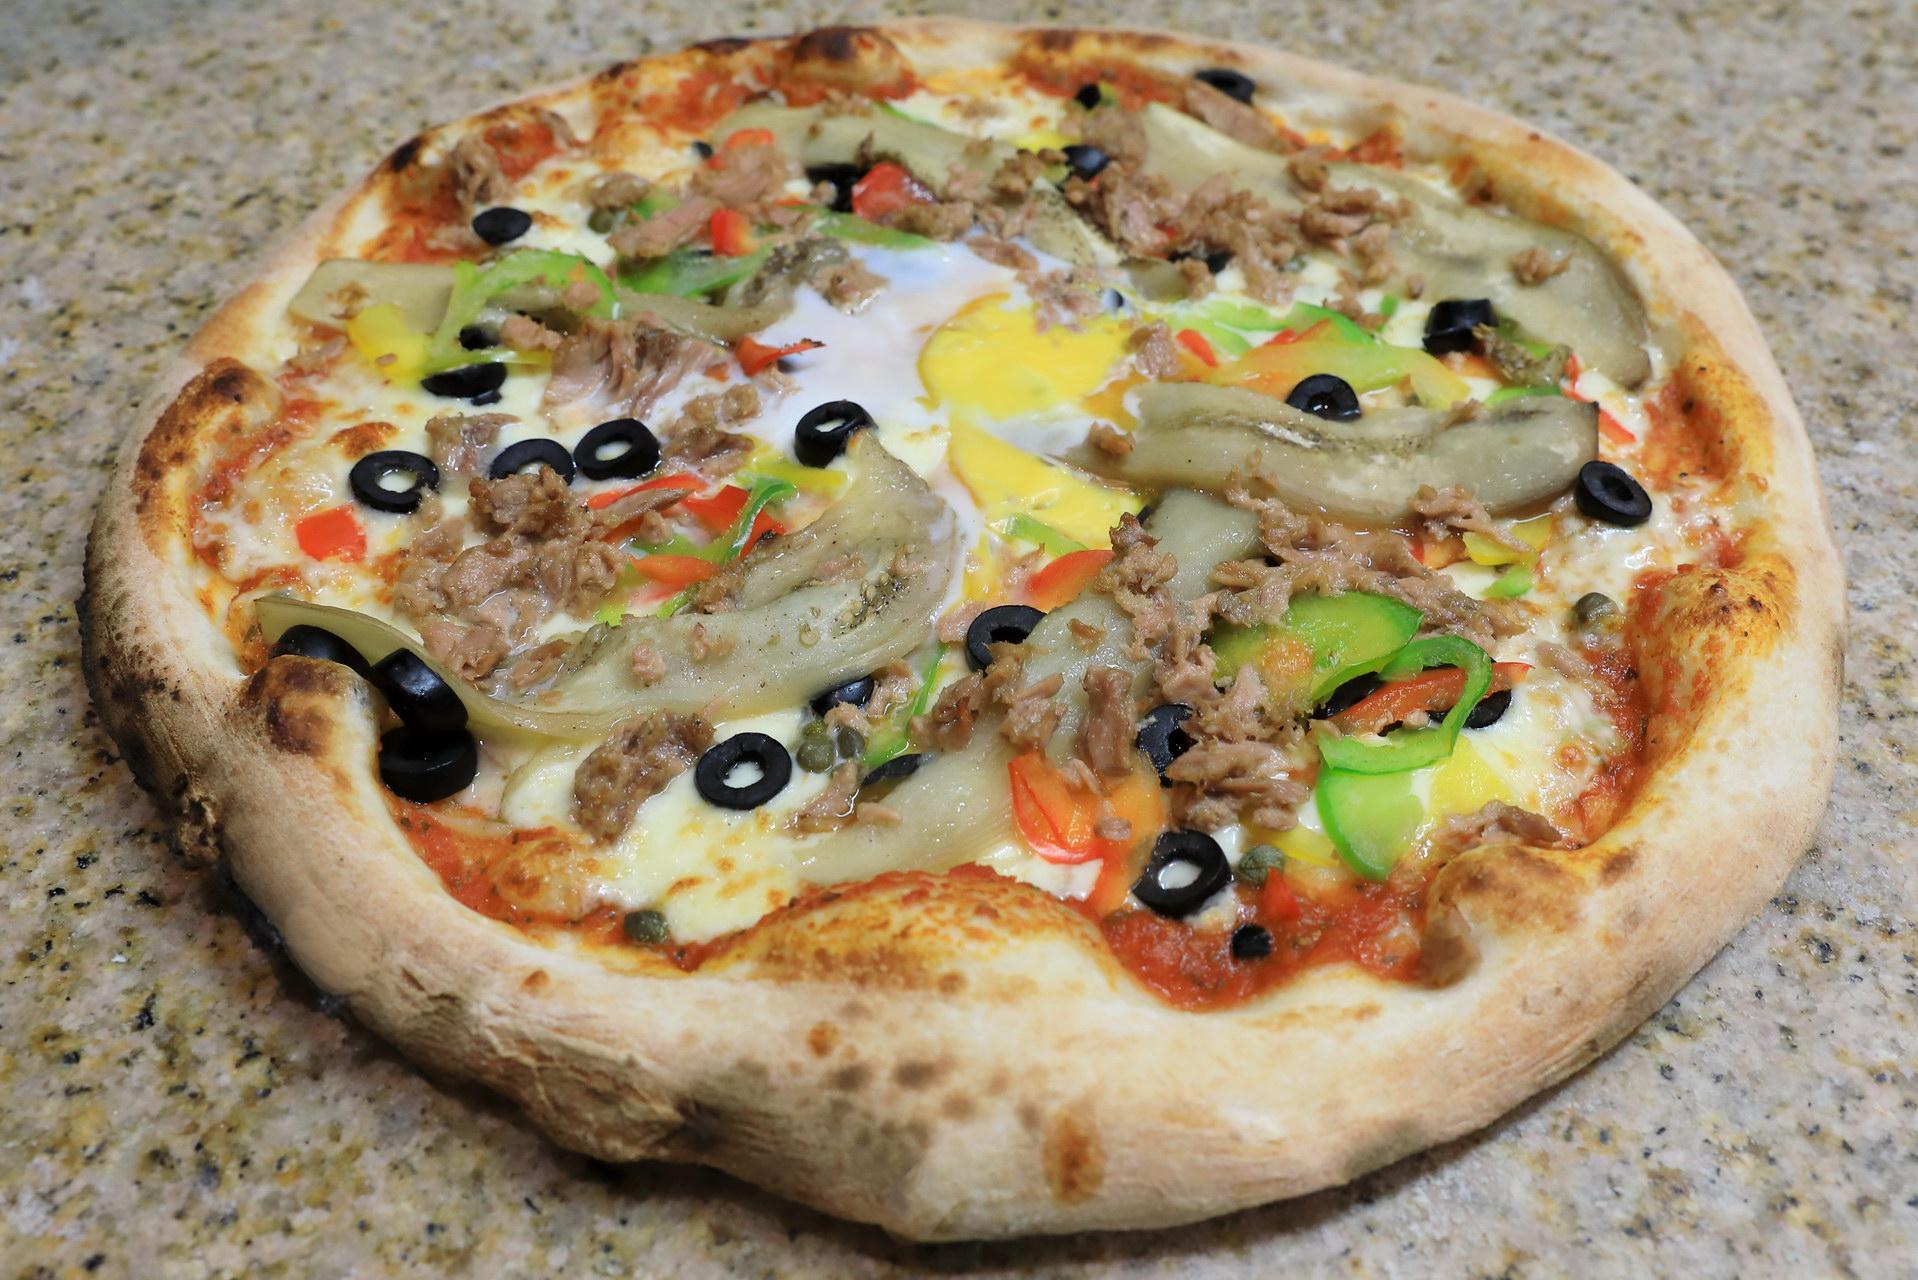 Le-Mediterraneen-Pizza-Braine-l-Alleud-0063.jpg